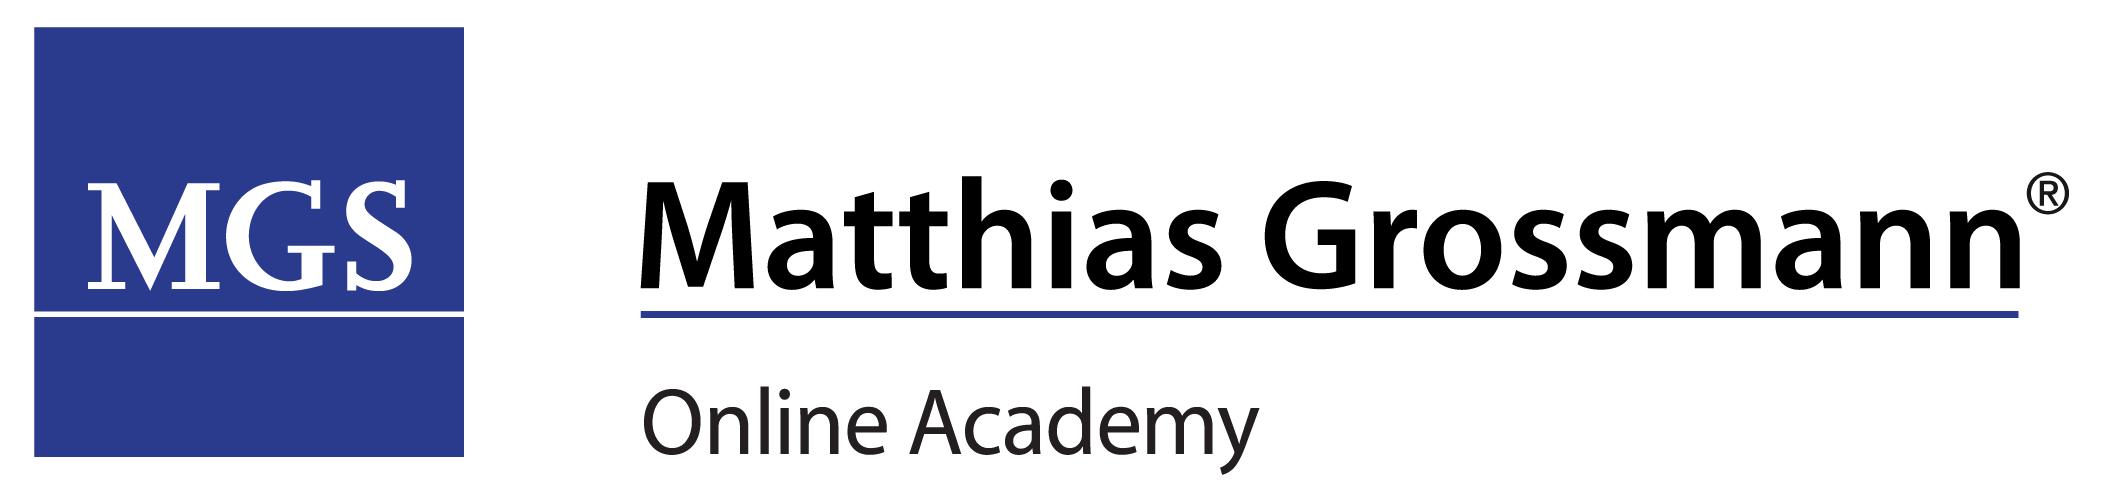 Matthias Grossmann® – Online Academy